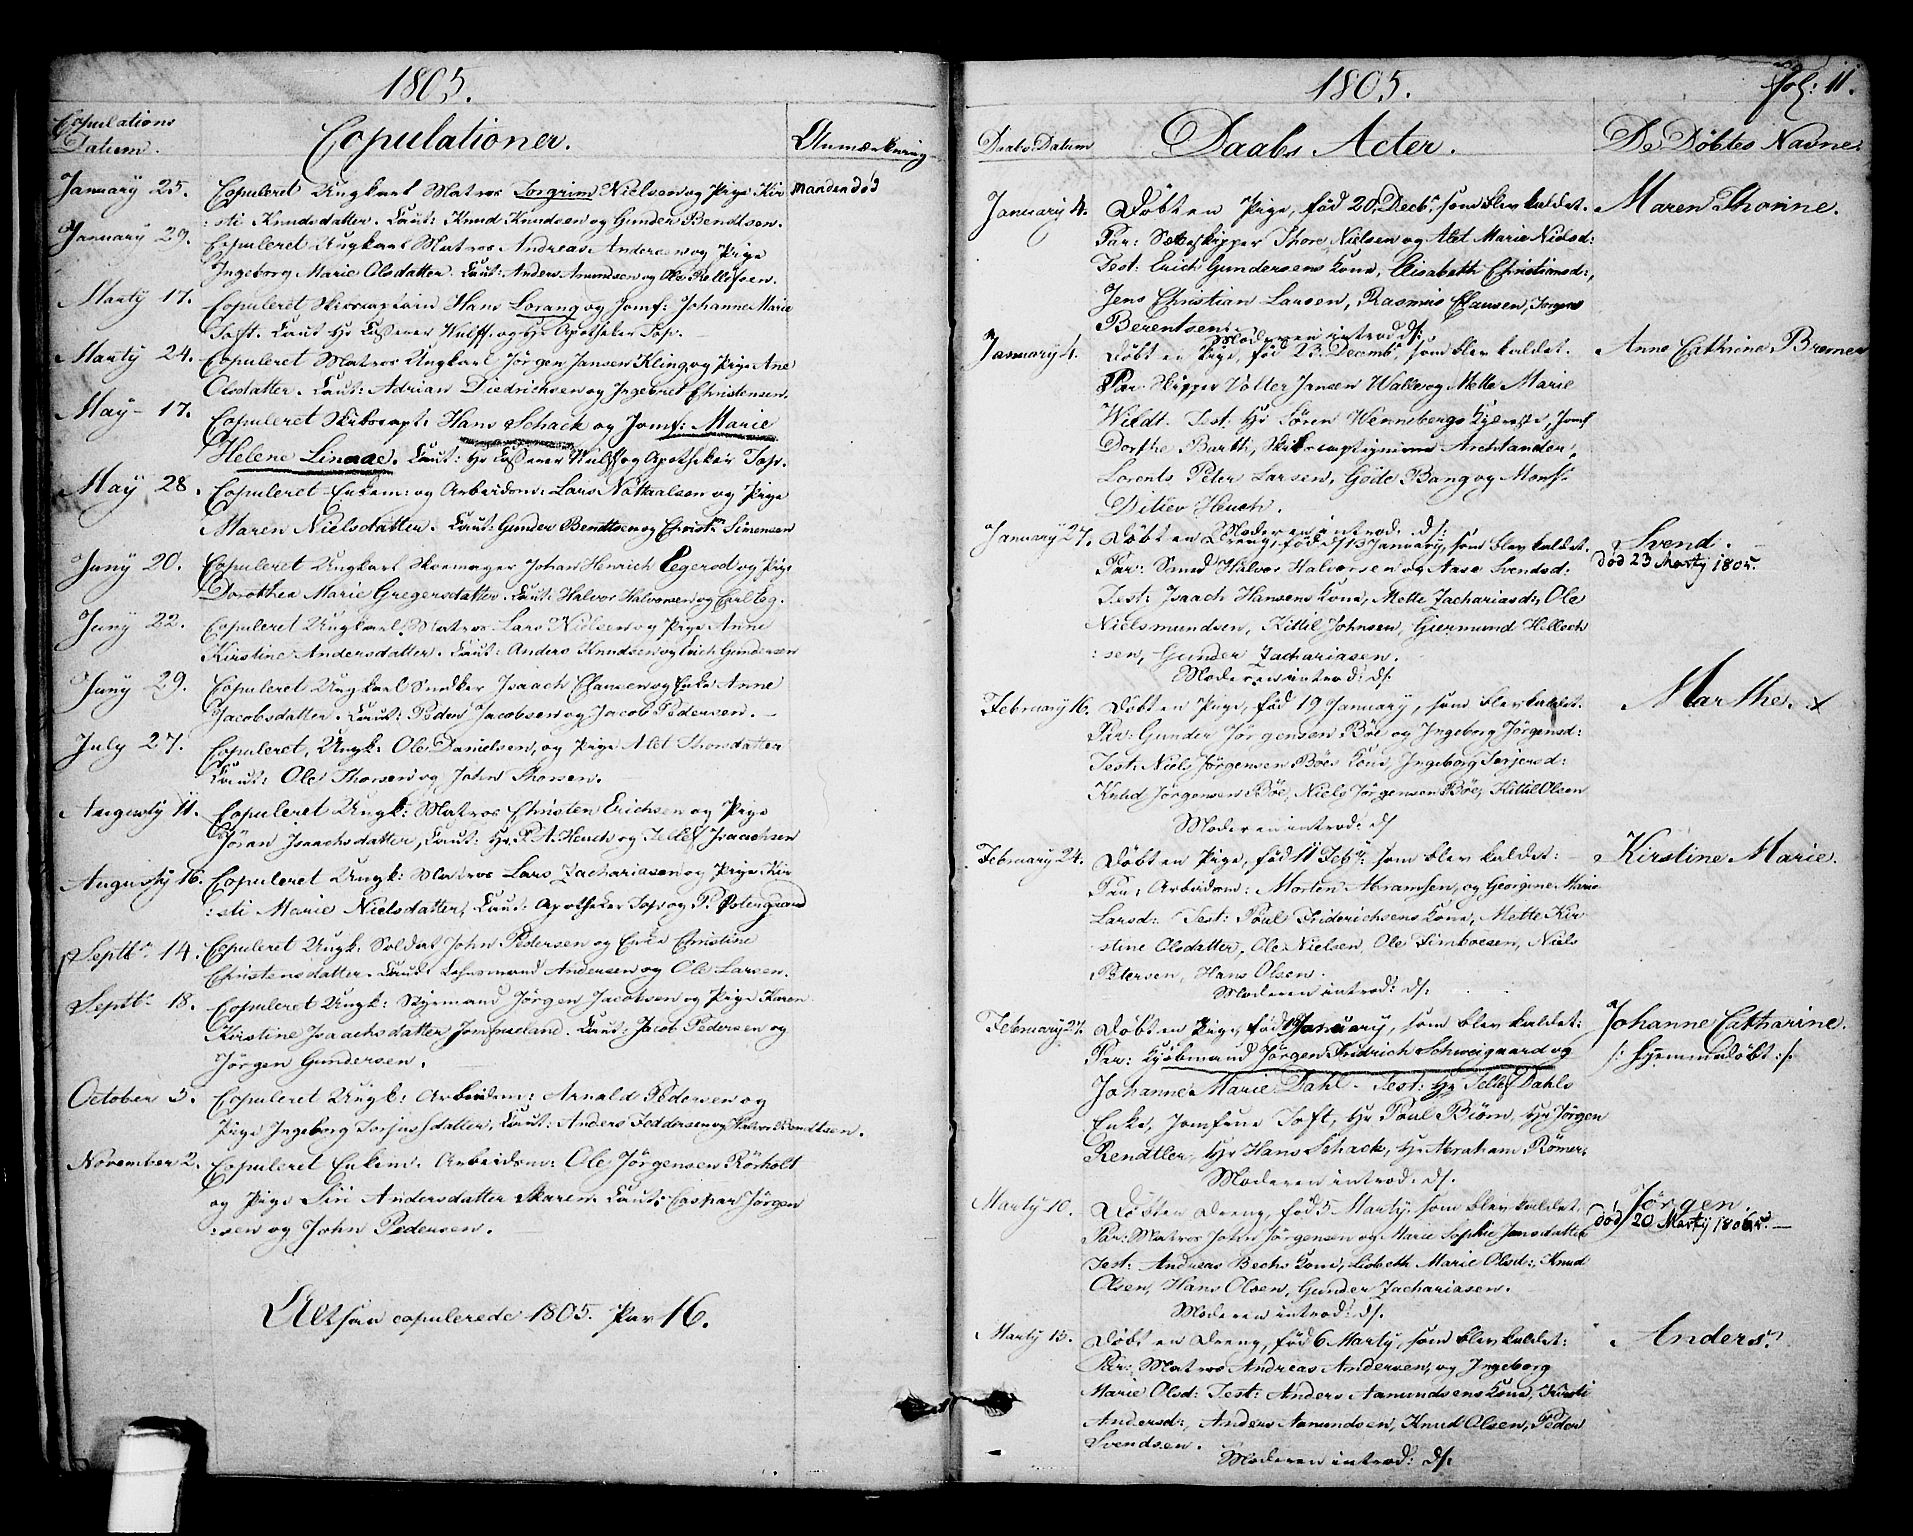 SAKO, Kragerø kirkebøker, F/Fa/L0003: Ministerialbok nr. 3, 1802-1813, s. 11